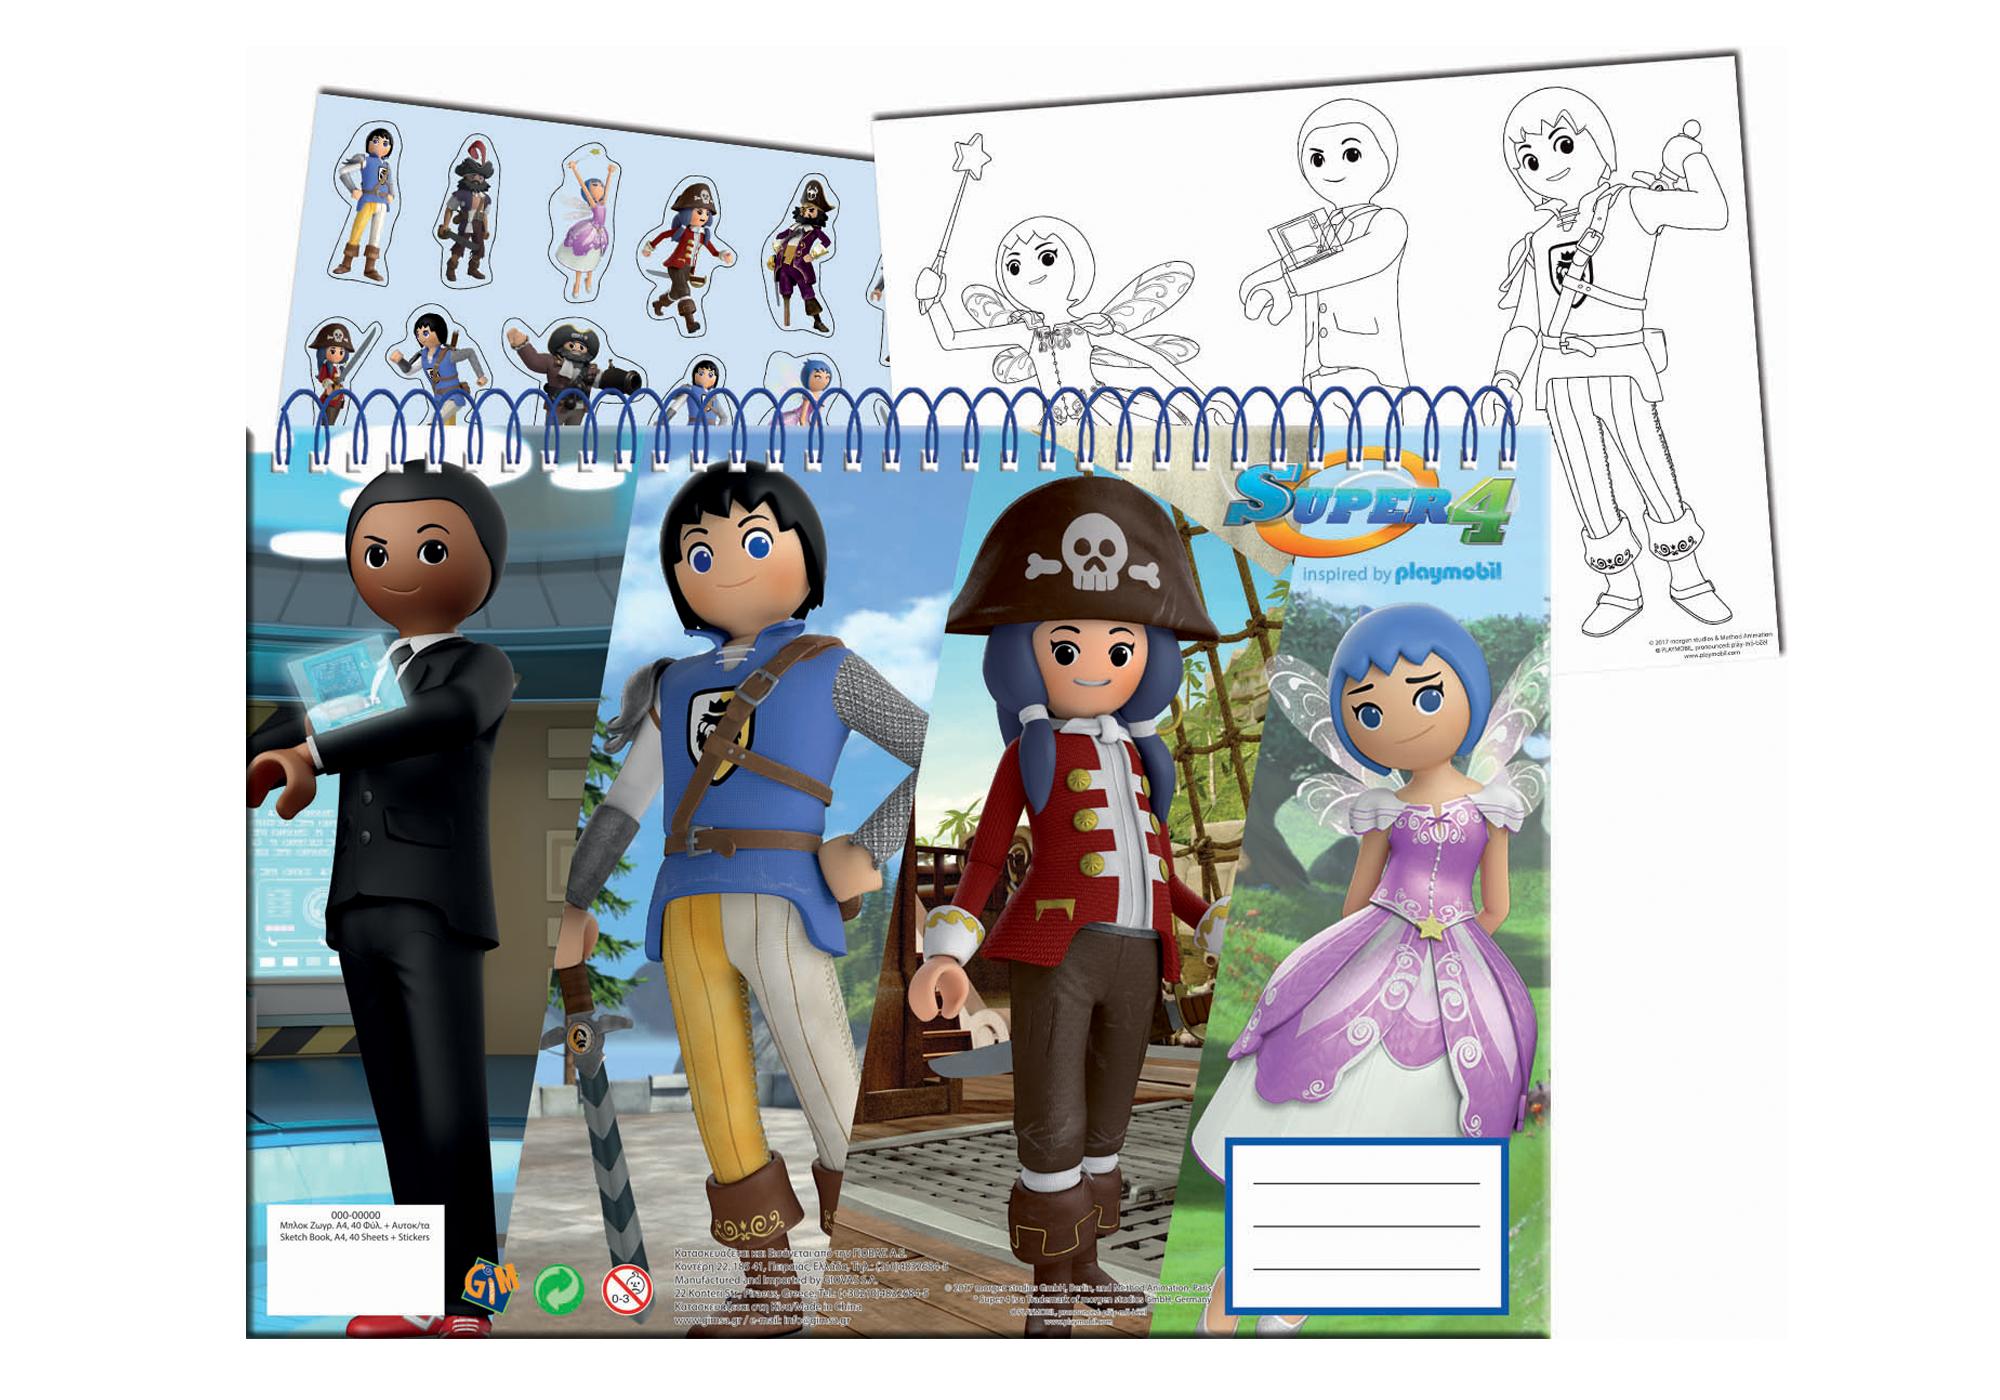 http://media.playmobil.com/i/playmobil/80081_product_detail/Sketchbook A4 mit Sticker - Super 4